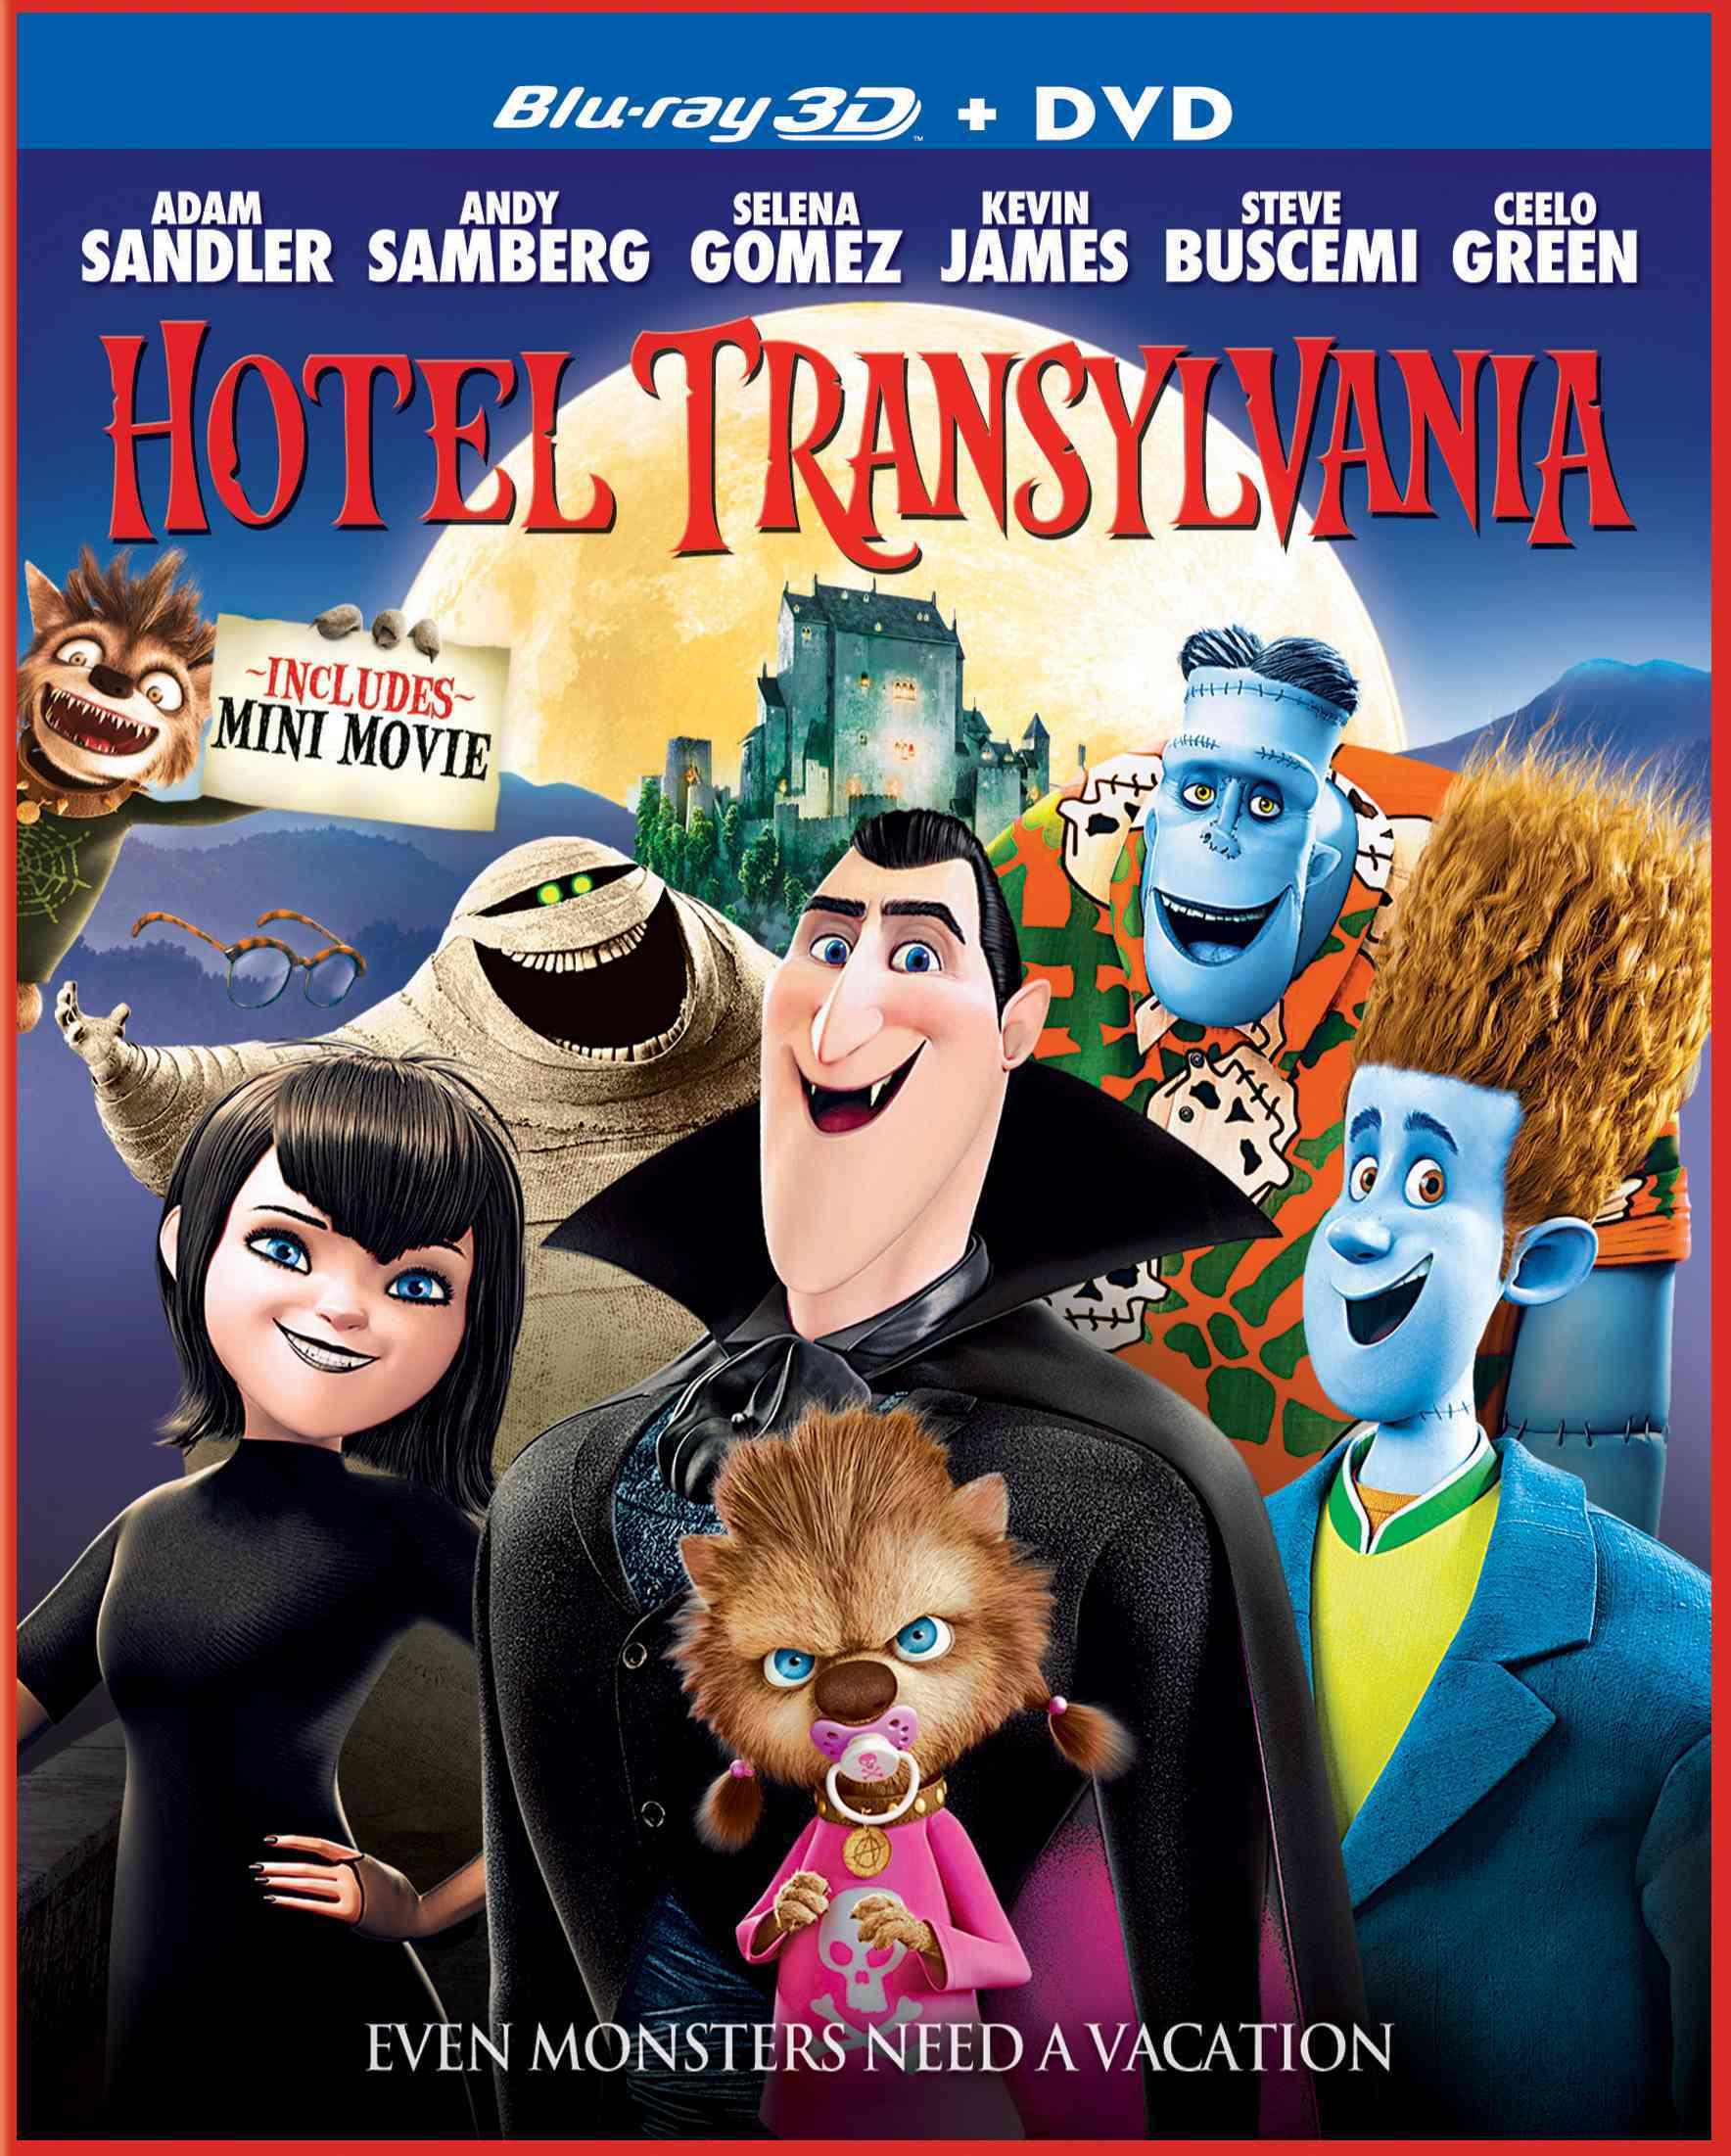 HOTEL TRANSYLVANIA (3D) BY SANDLER,ADAM (Blu-Ray)